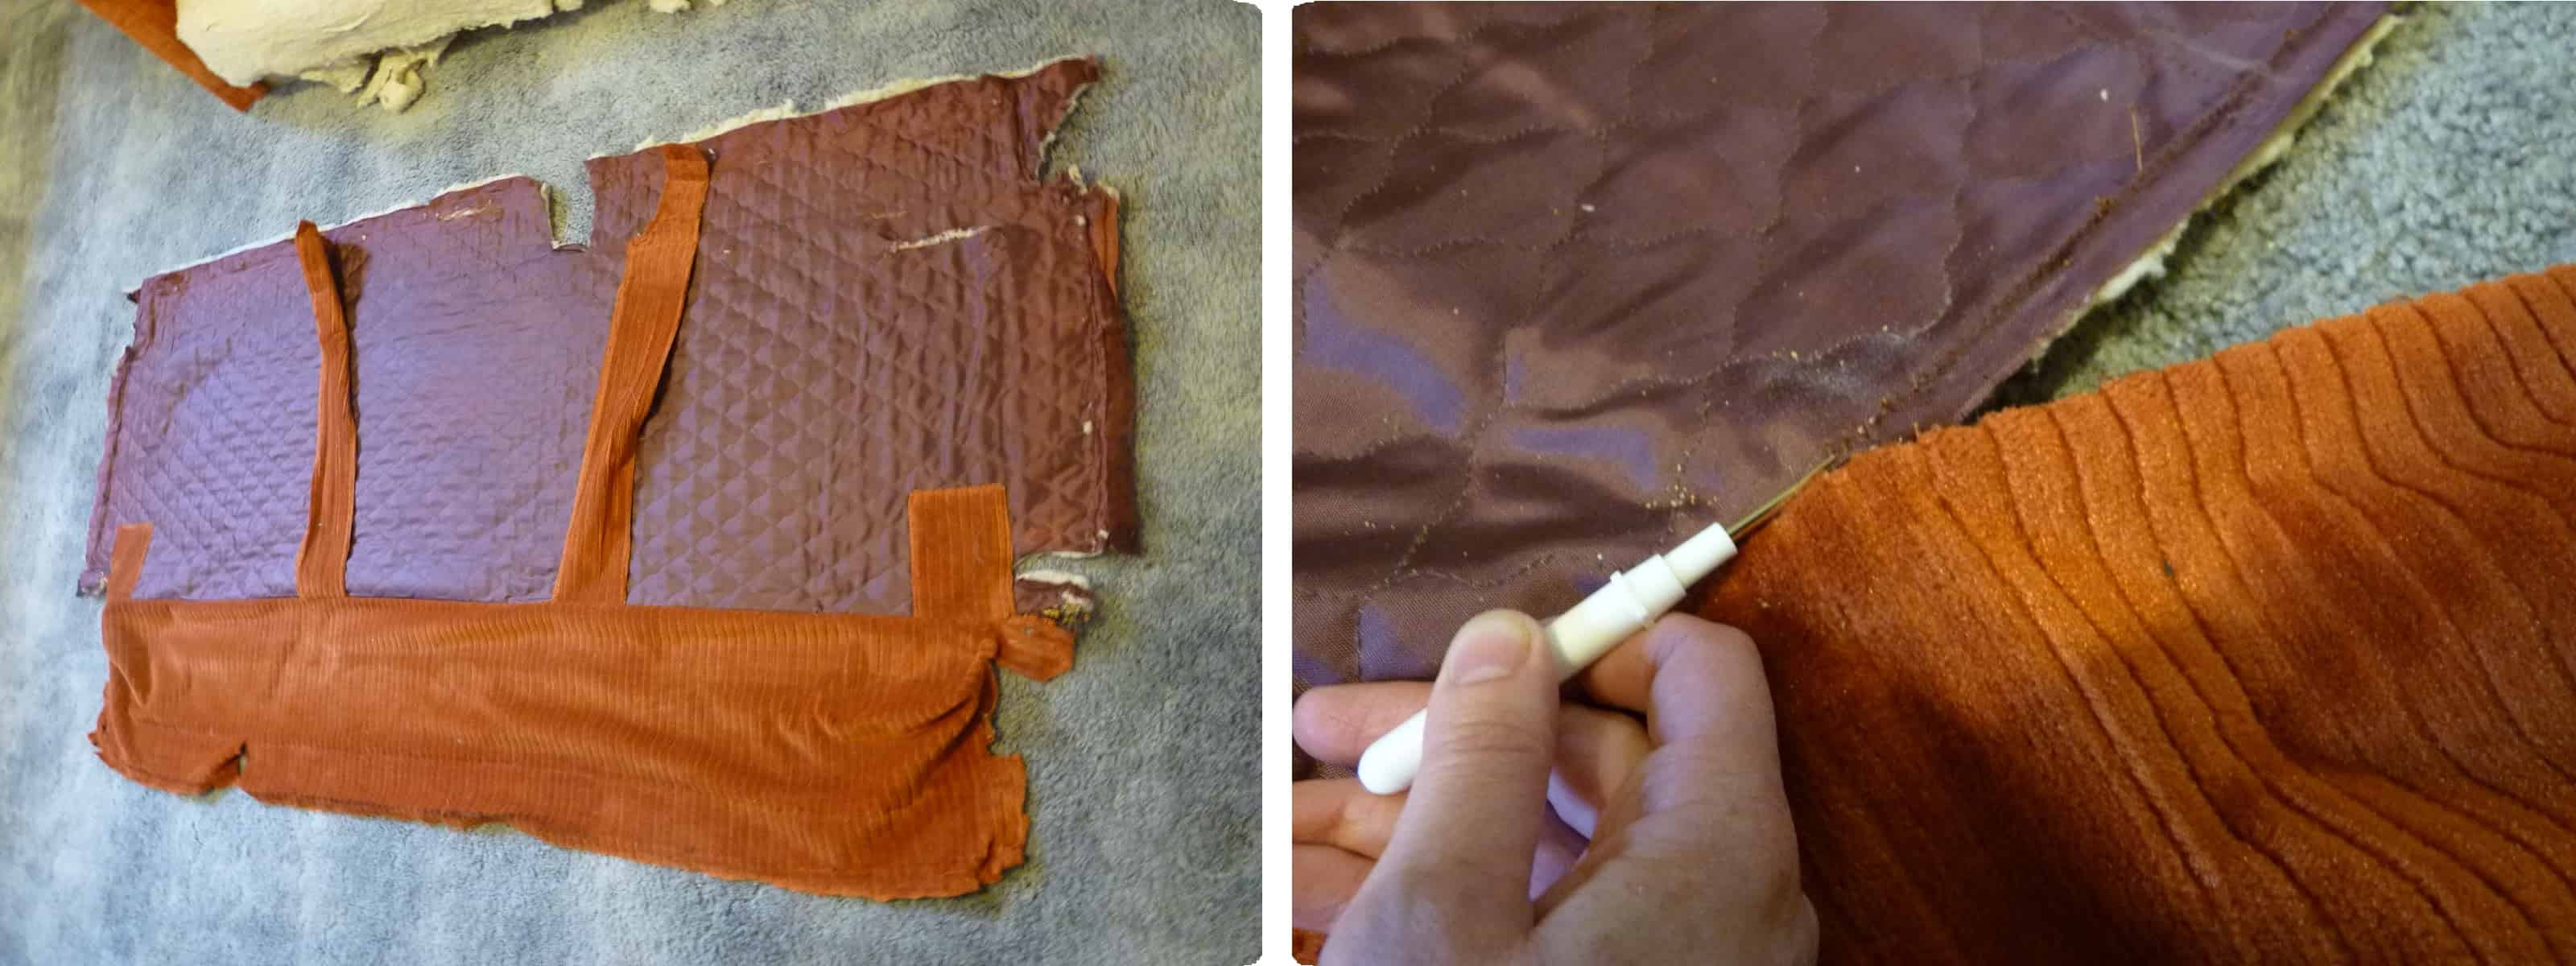 costura de unión de almohadones de tela para tapizar sillón